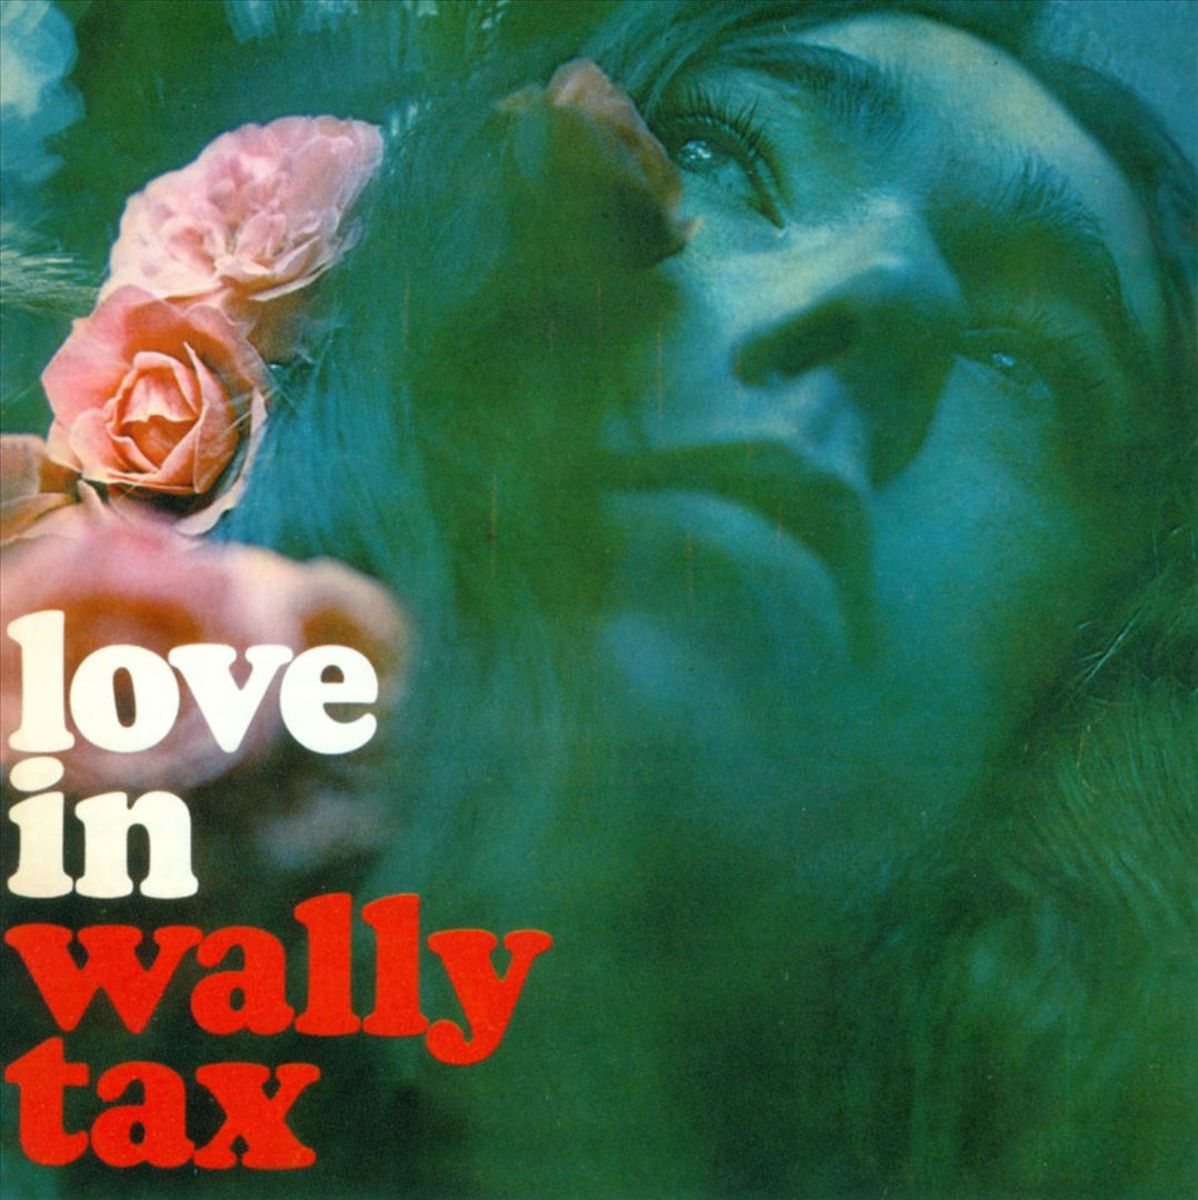 wally tax love in